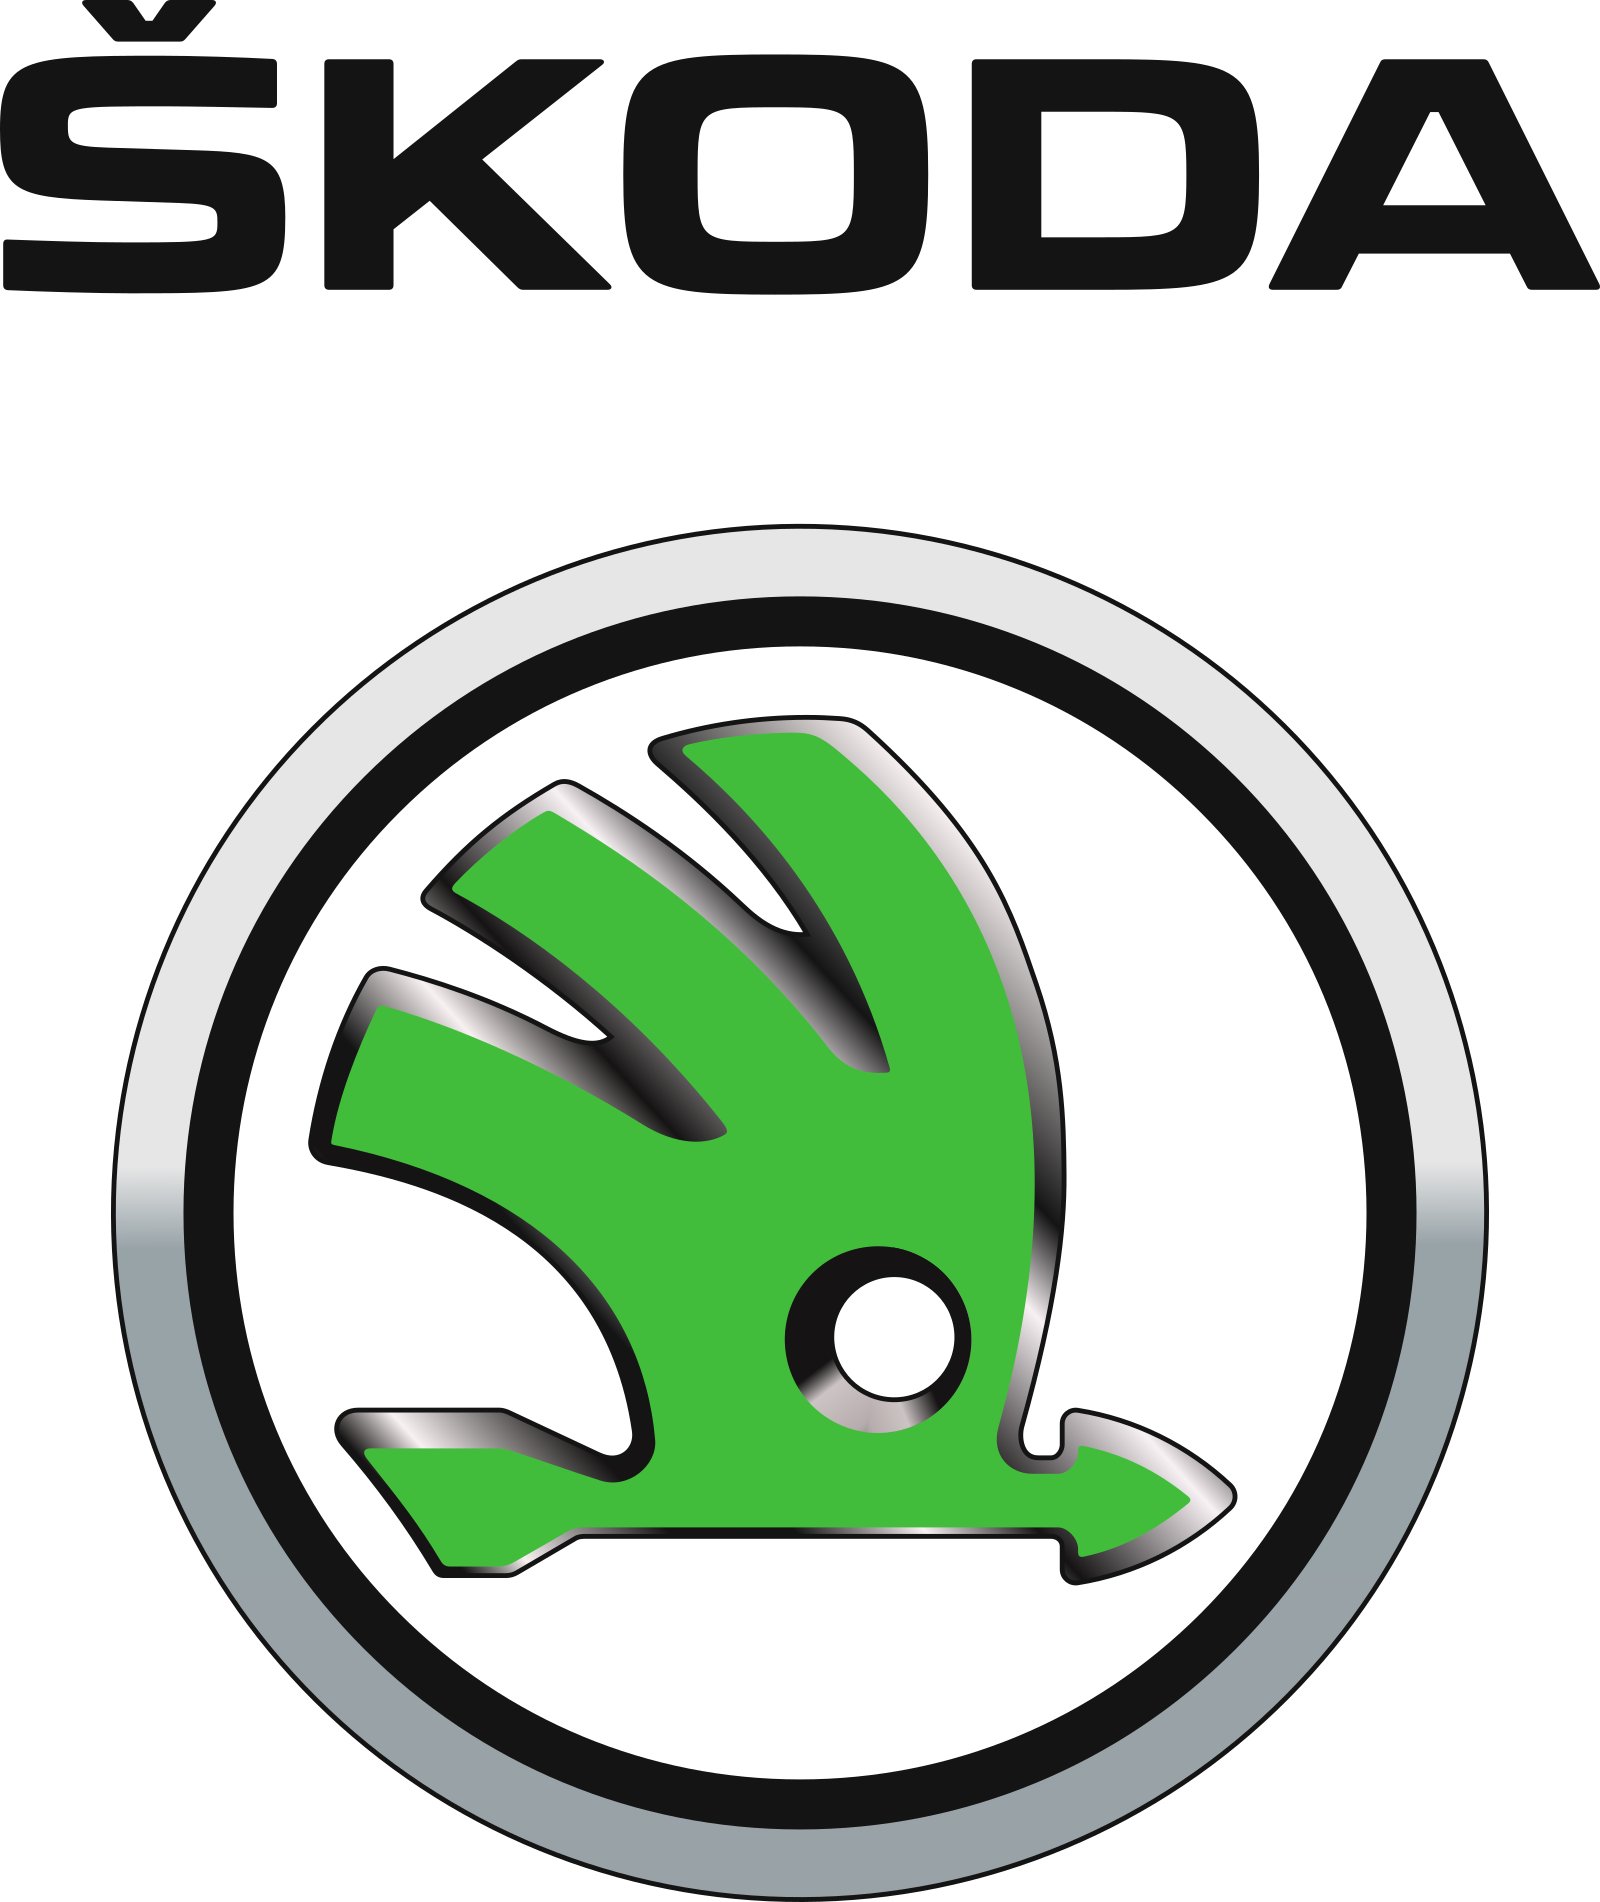 skoda-auto-logo-5